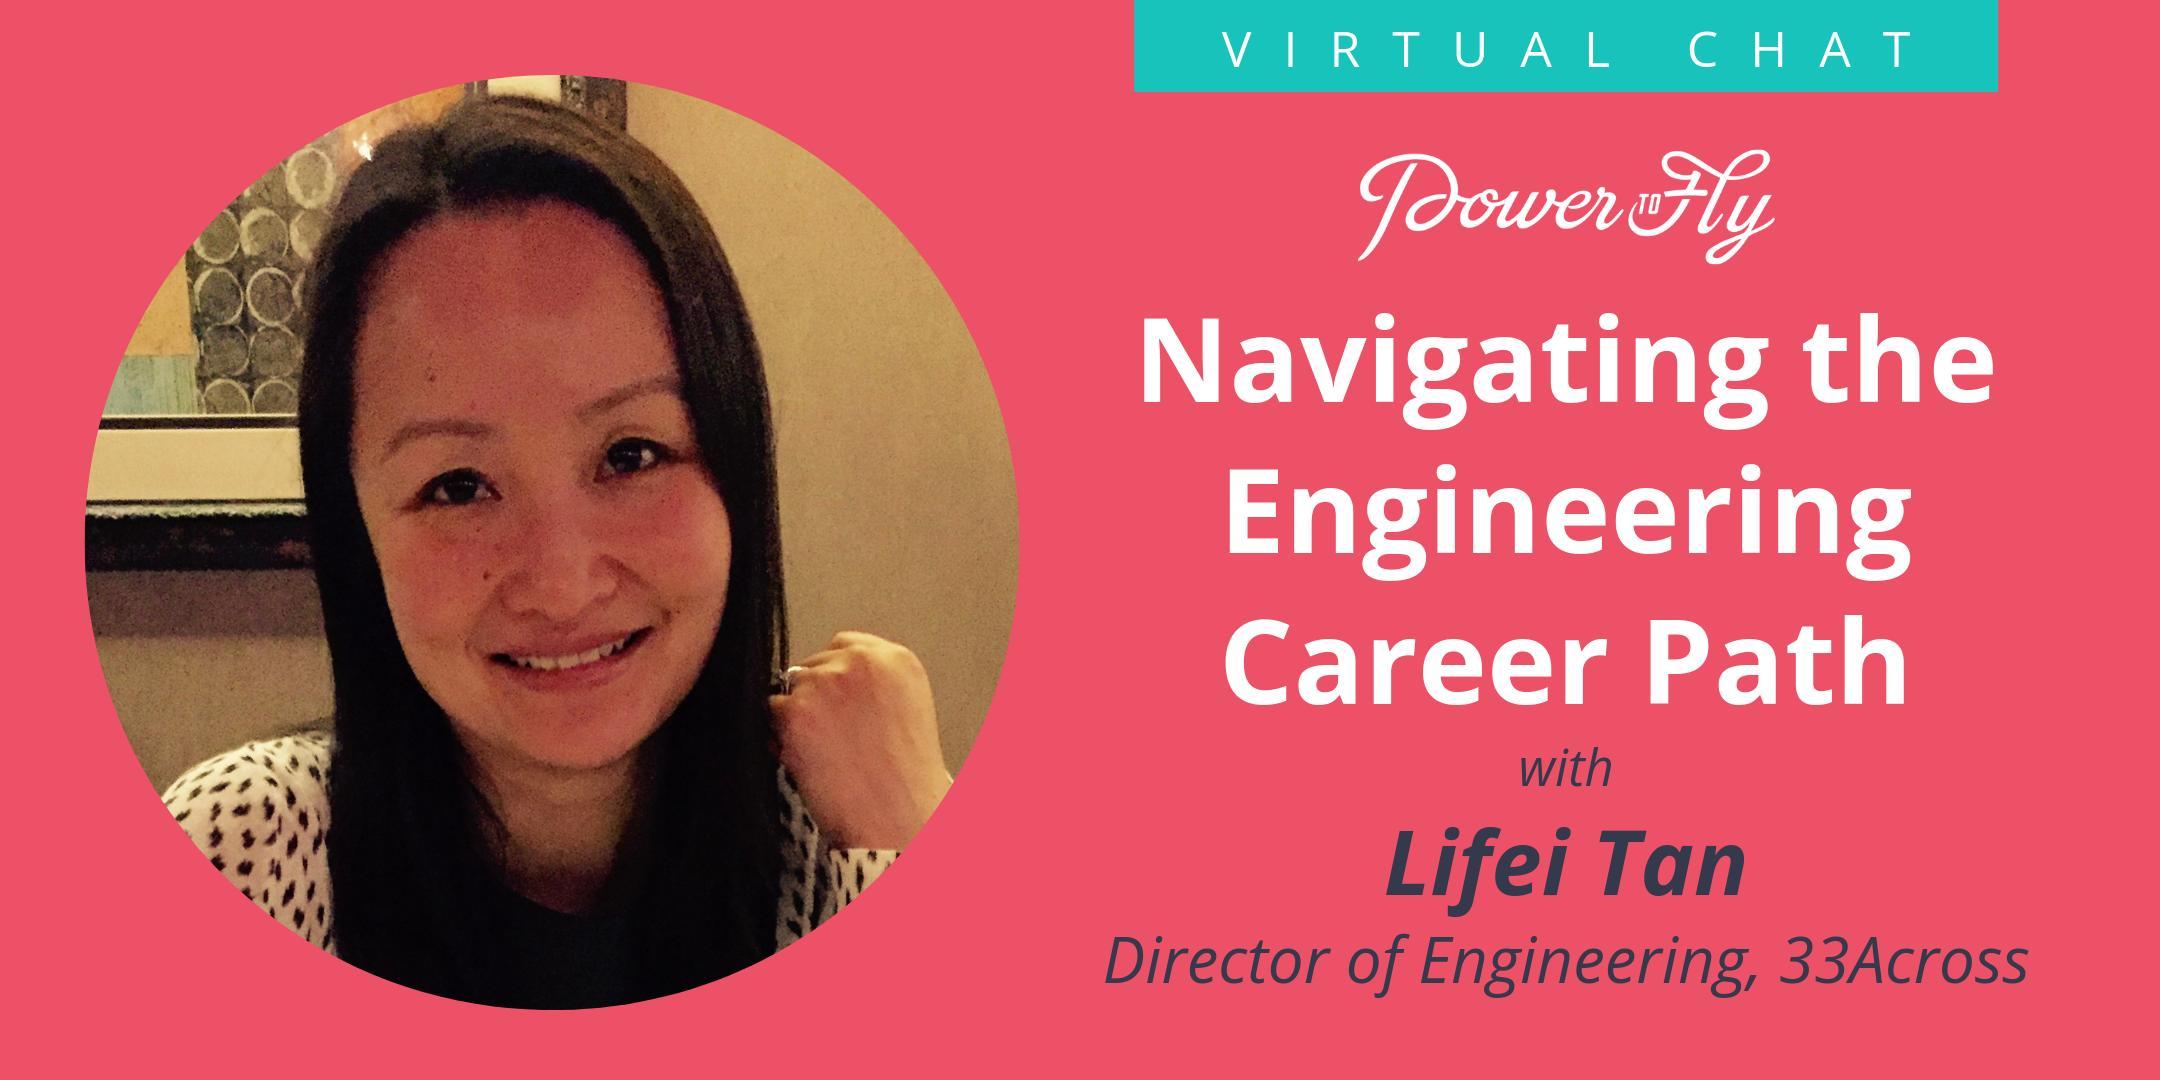 Navigating the Engineering Career Path